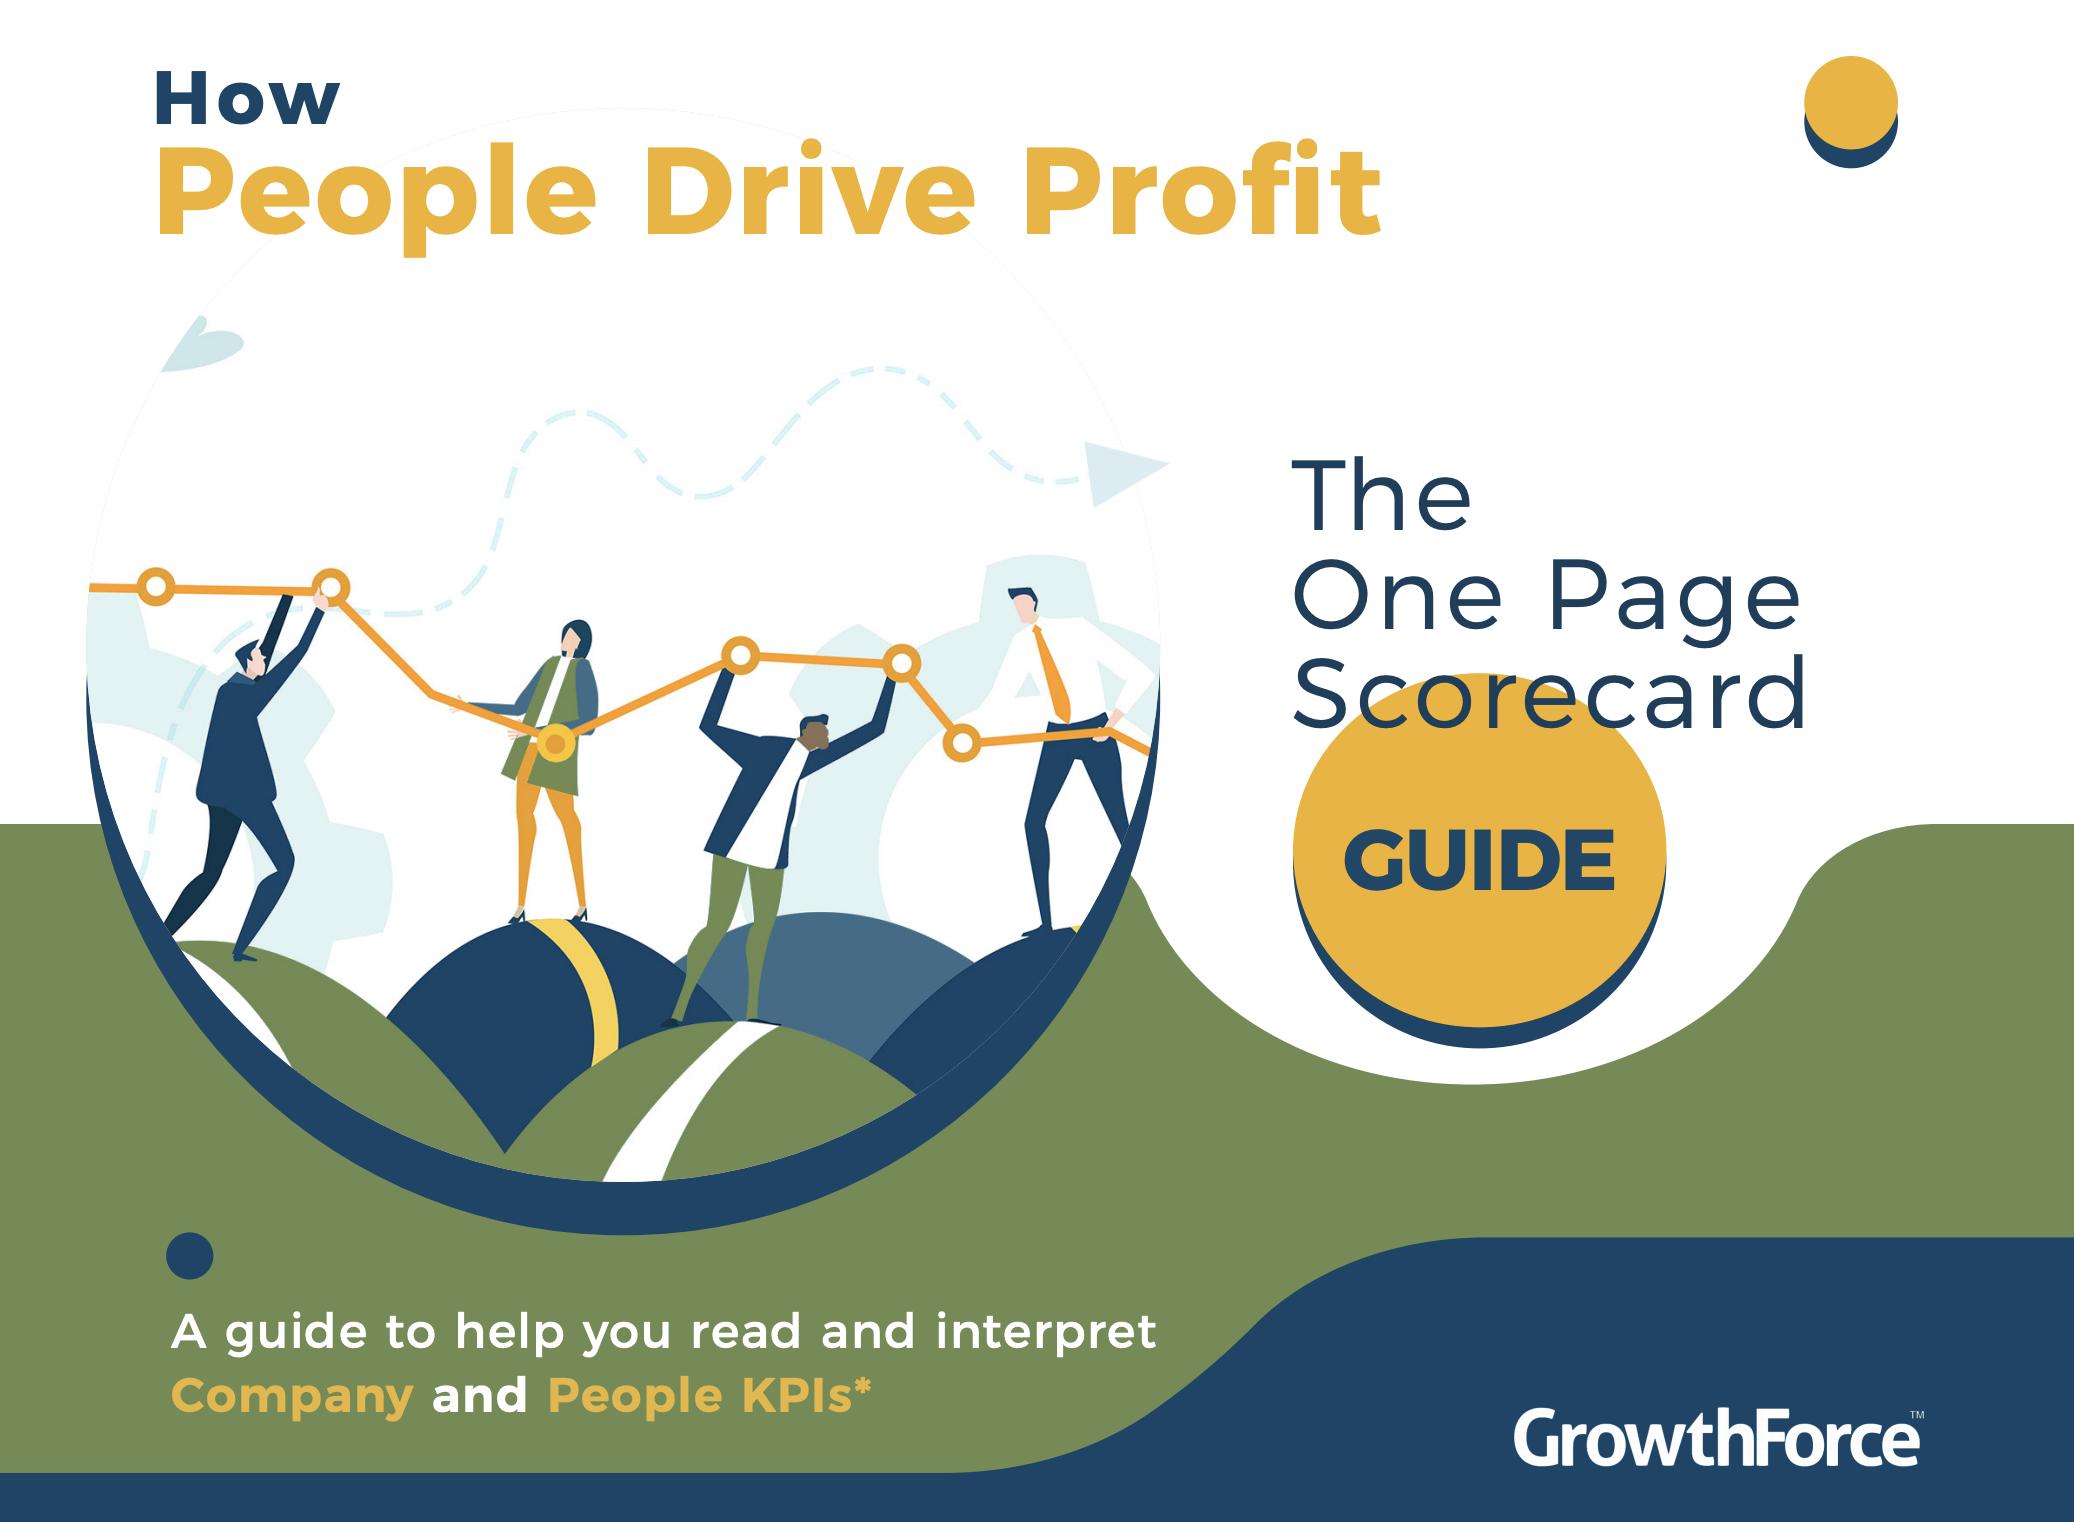 How People Drive Profit1